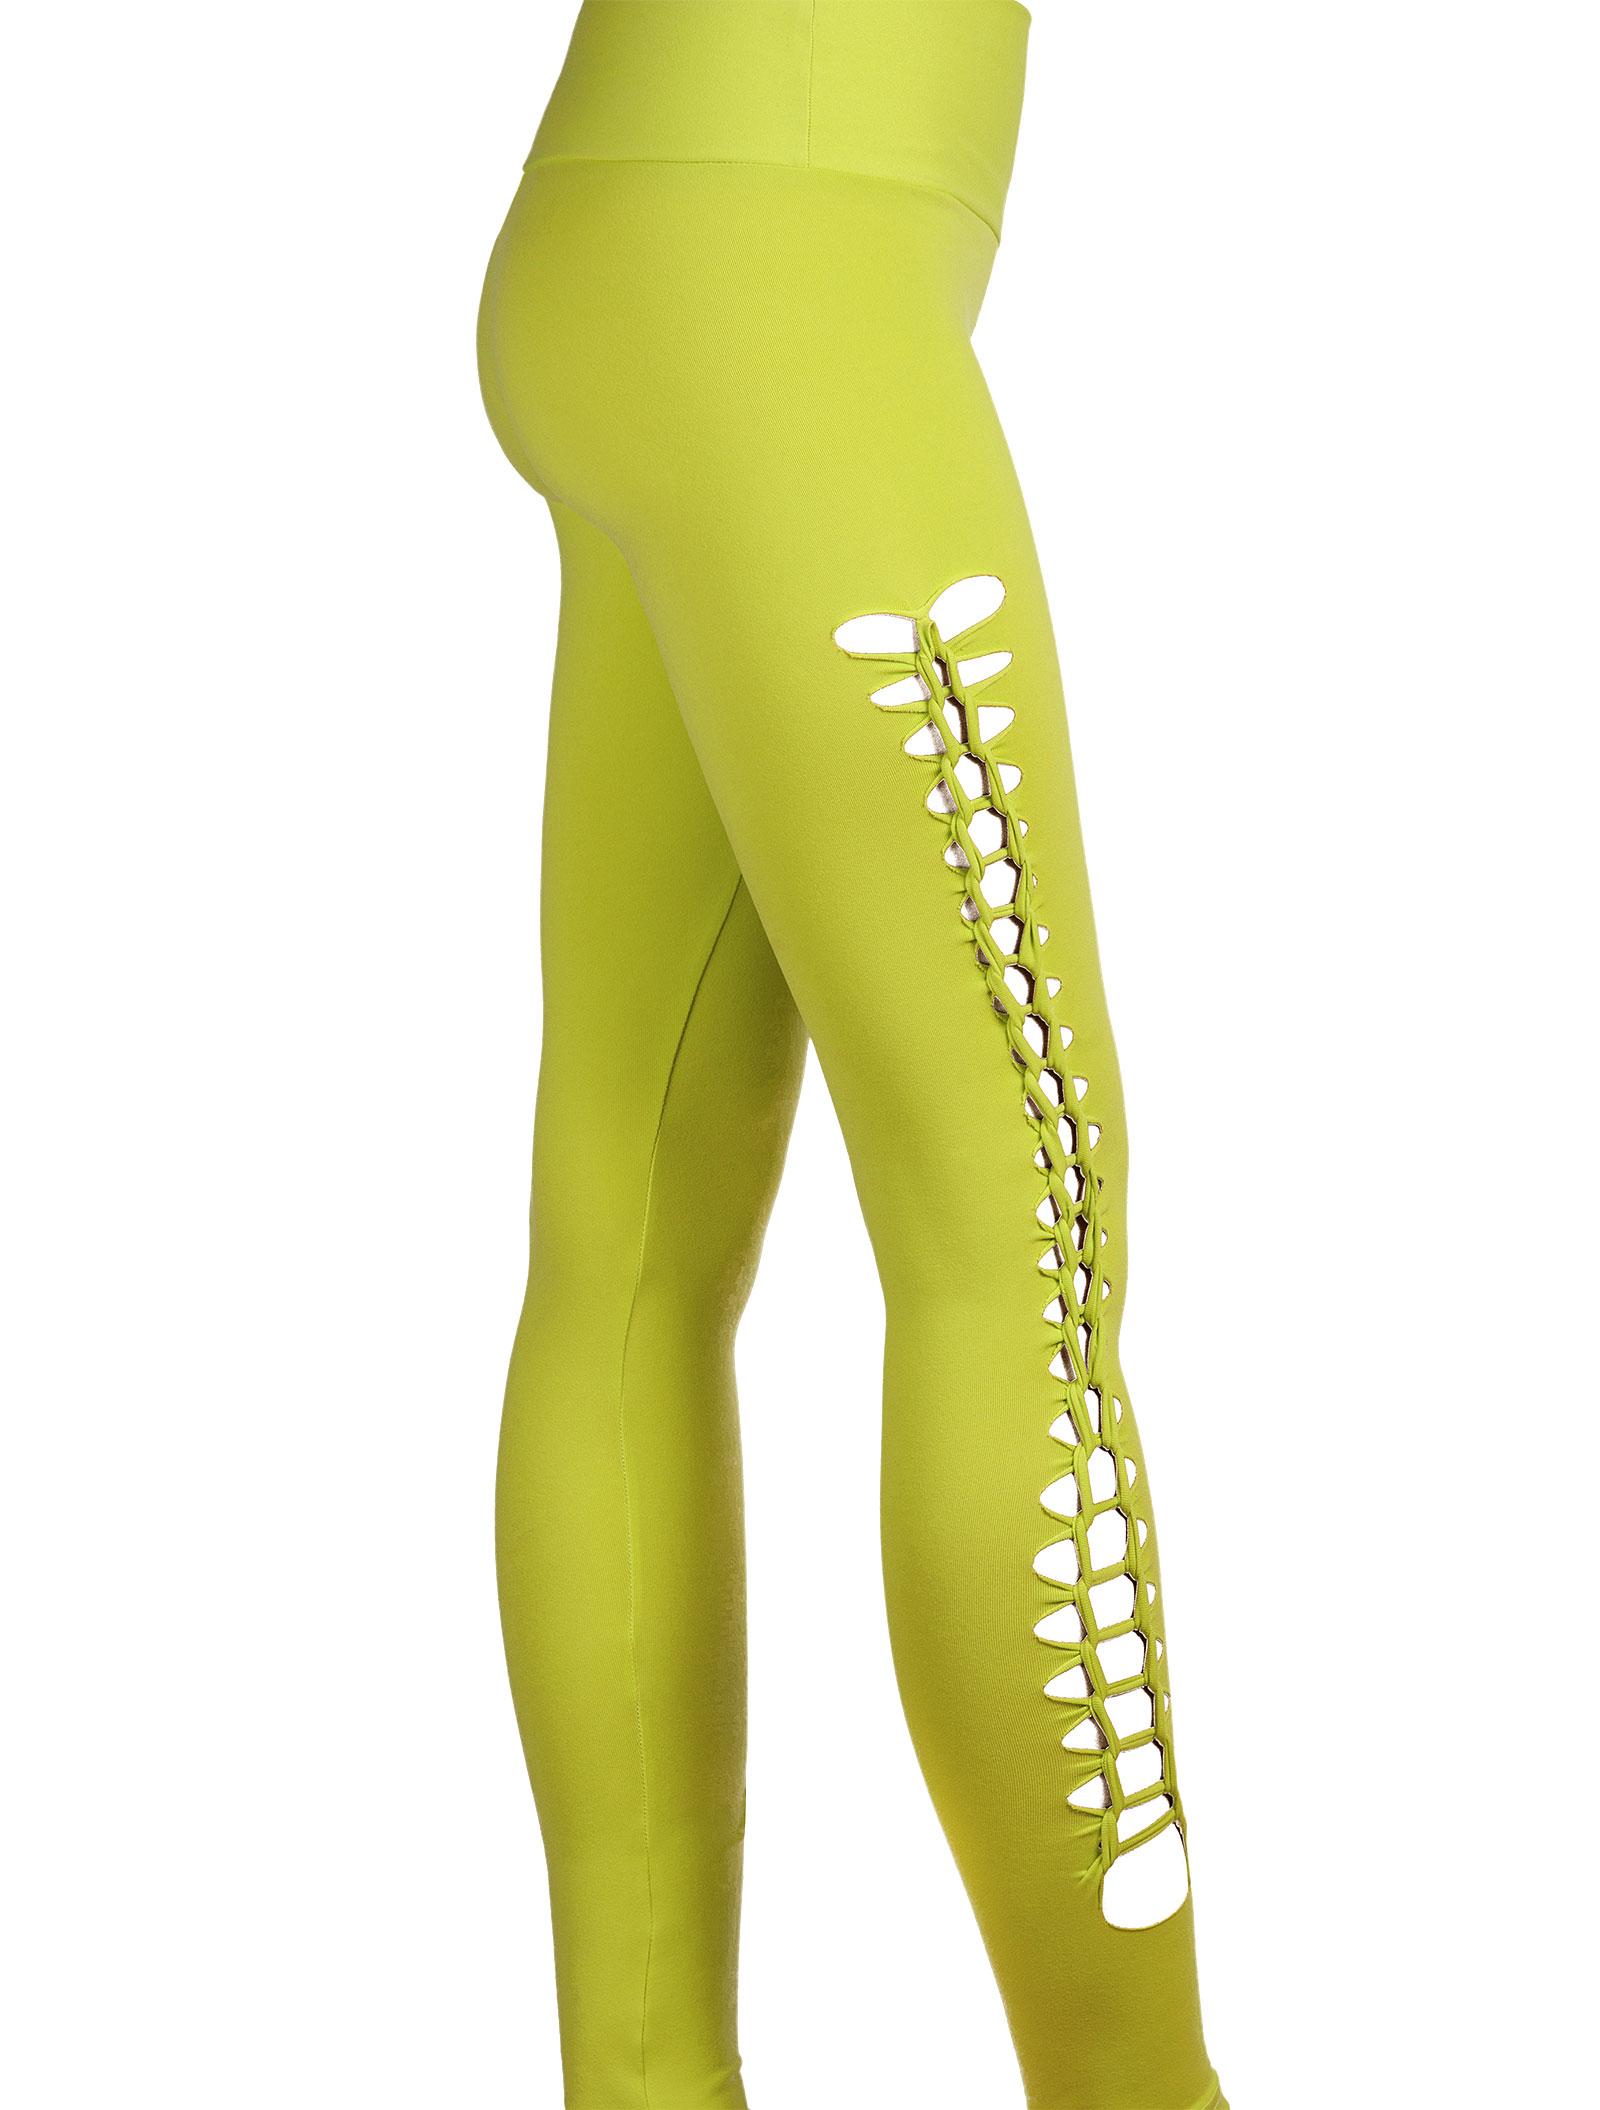 Fitness bottom Lime Green Openwork Workout Leggings Tresse ...